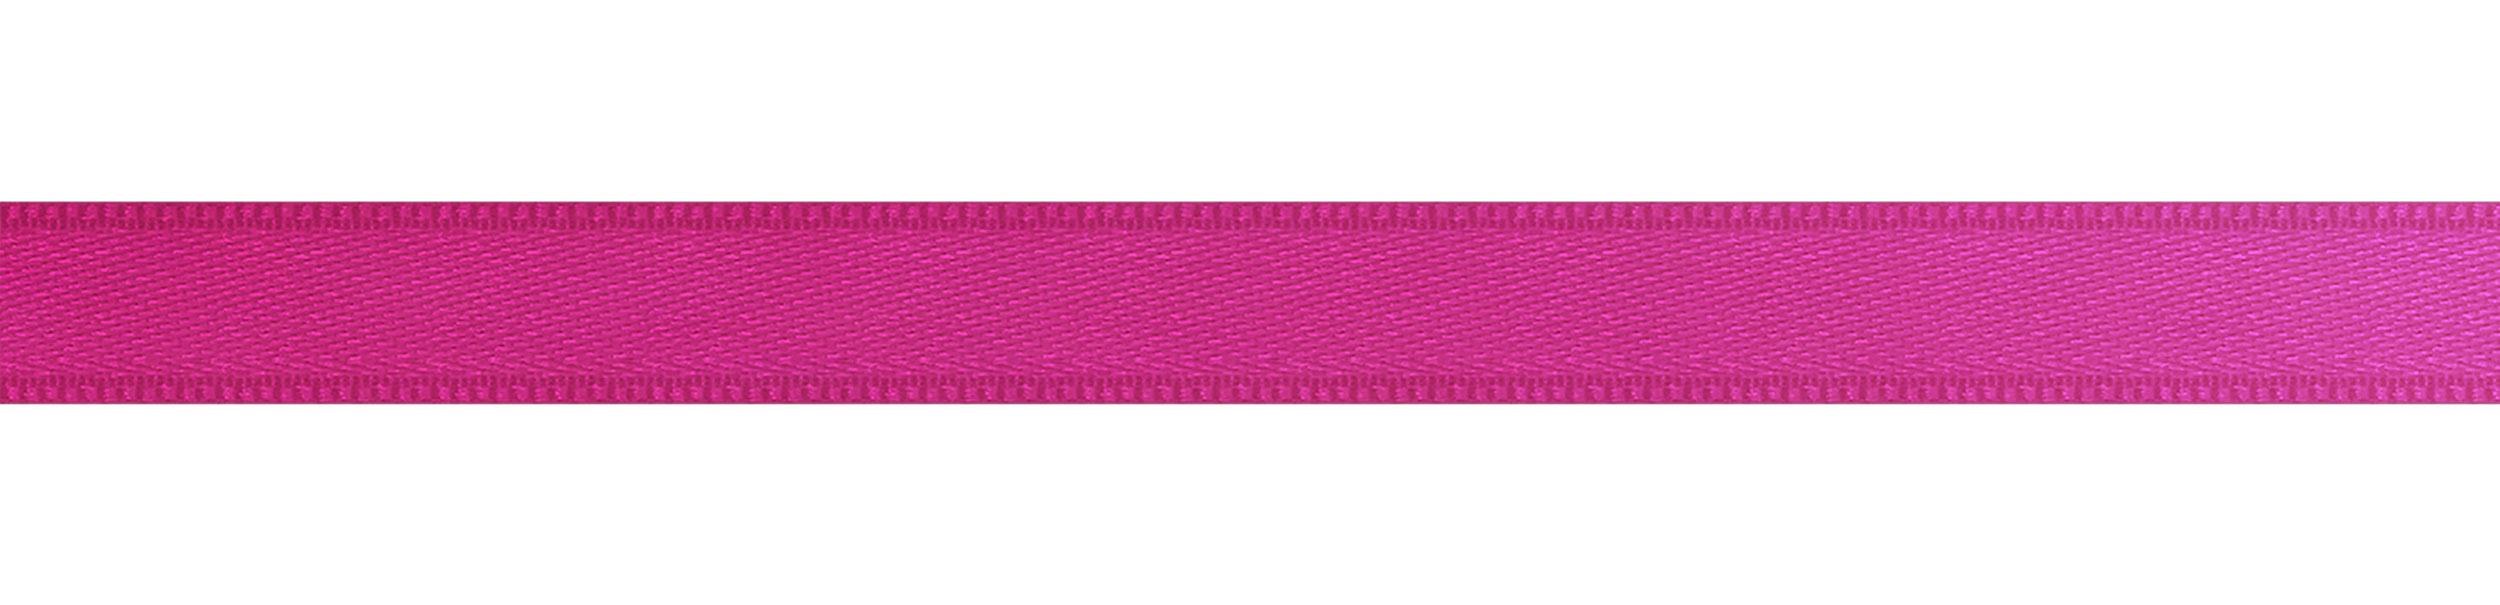 Satin Ribbon 10 Mm Without Imprint 8347 Fuchsia Dahlinger